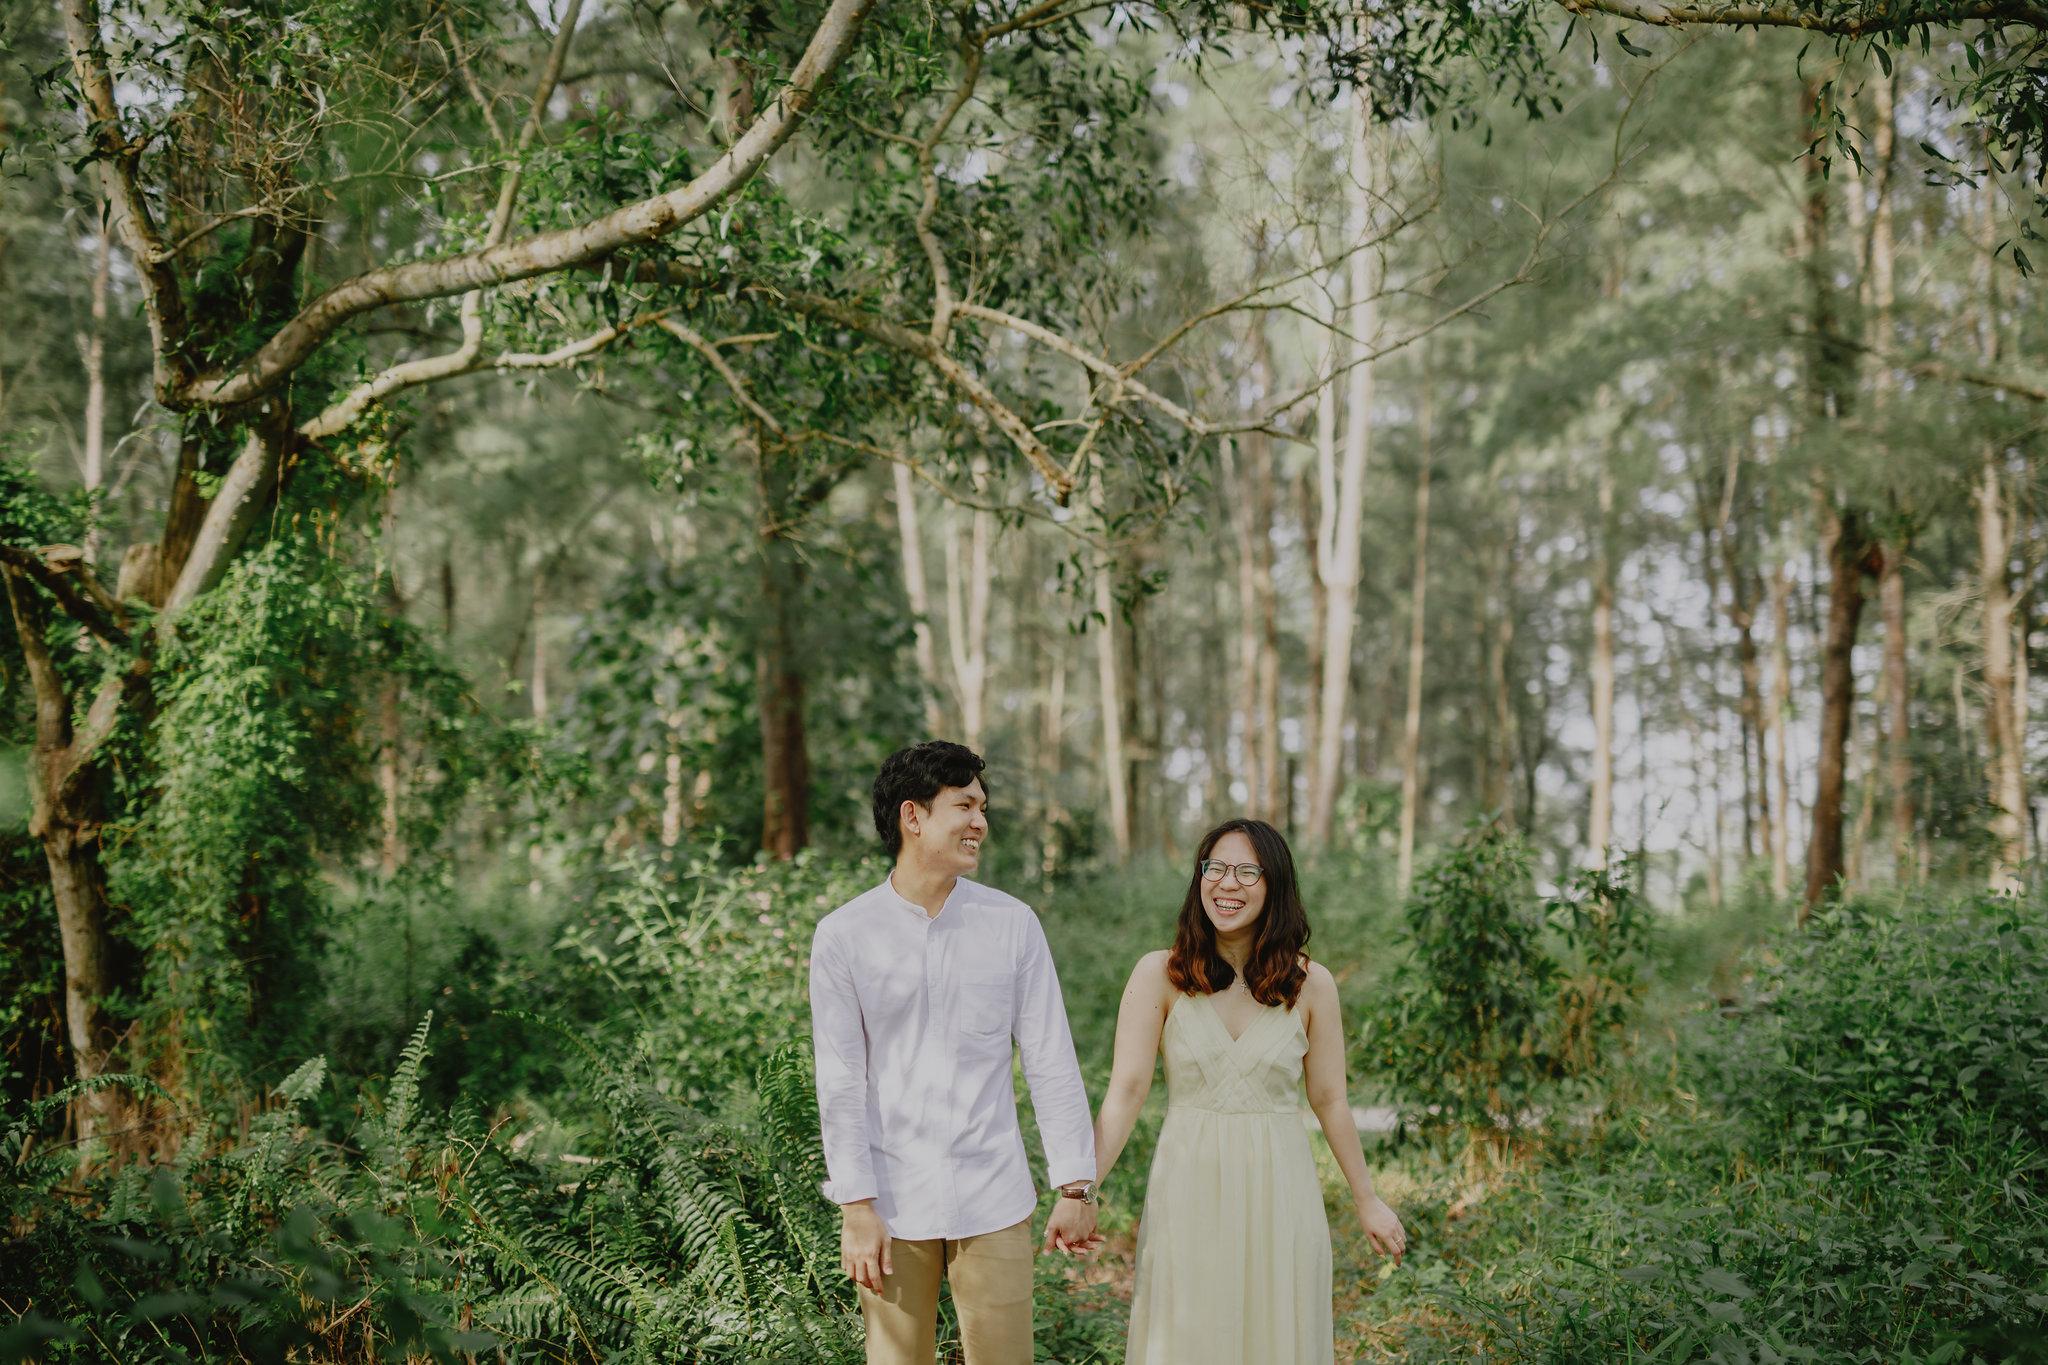 Yingjie+Rachel-162.jpg